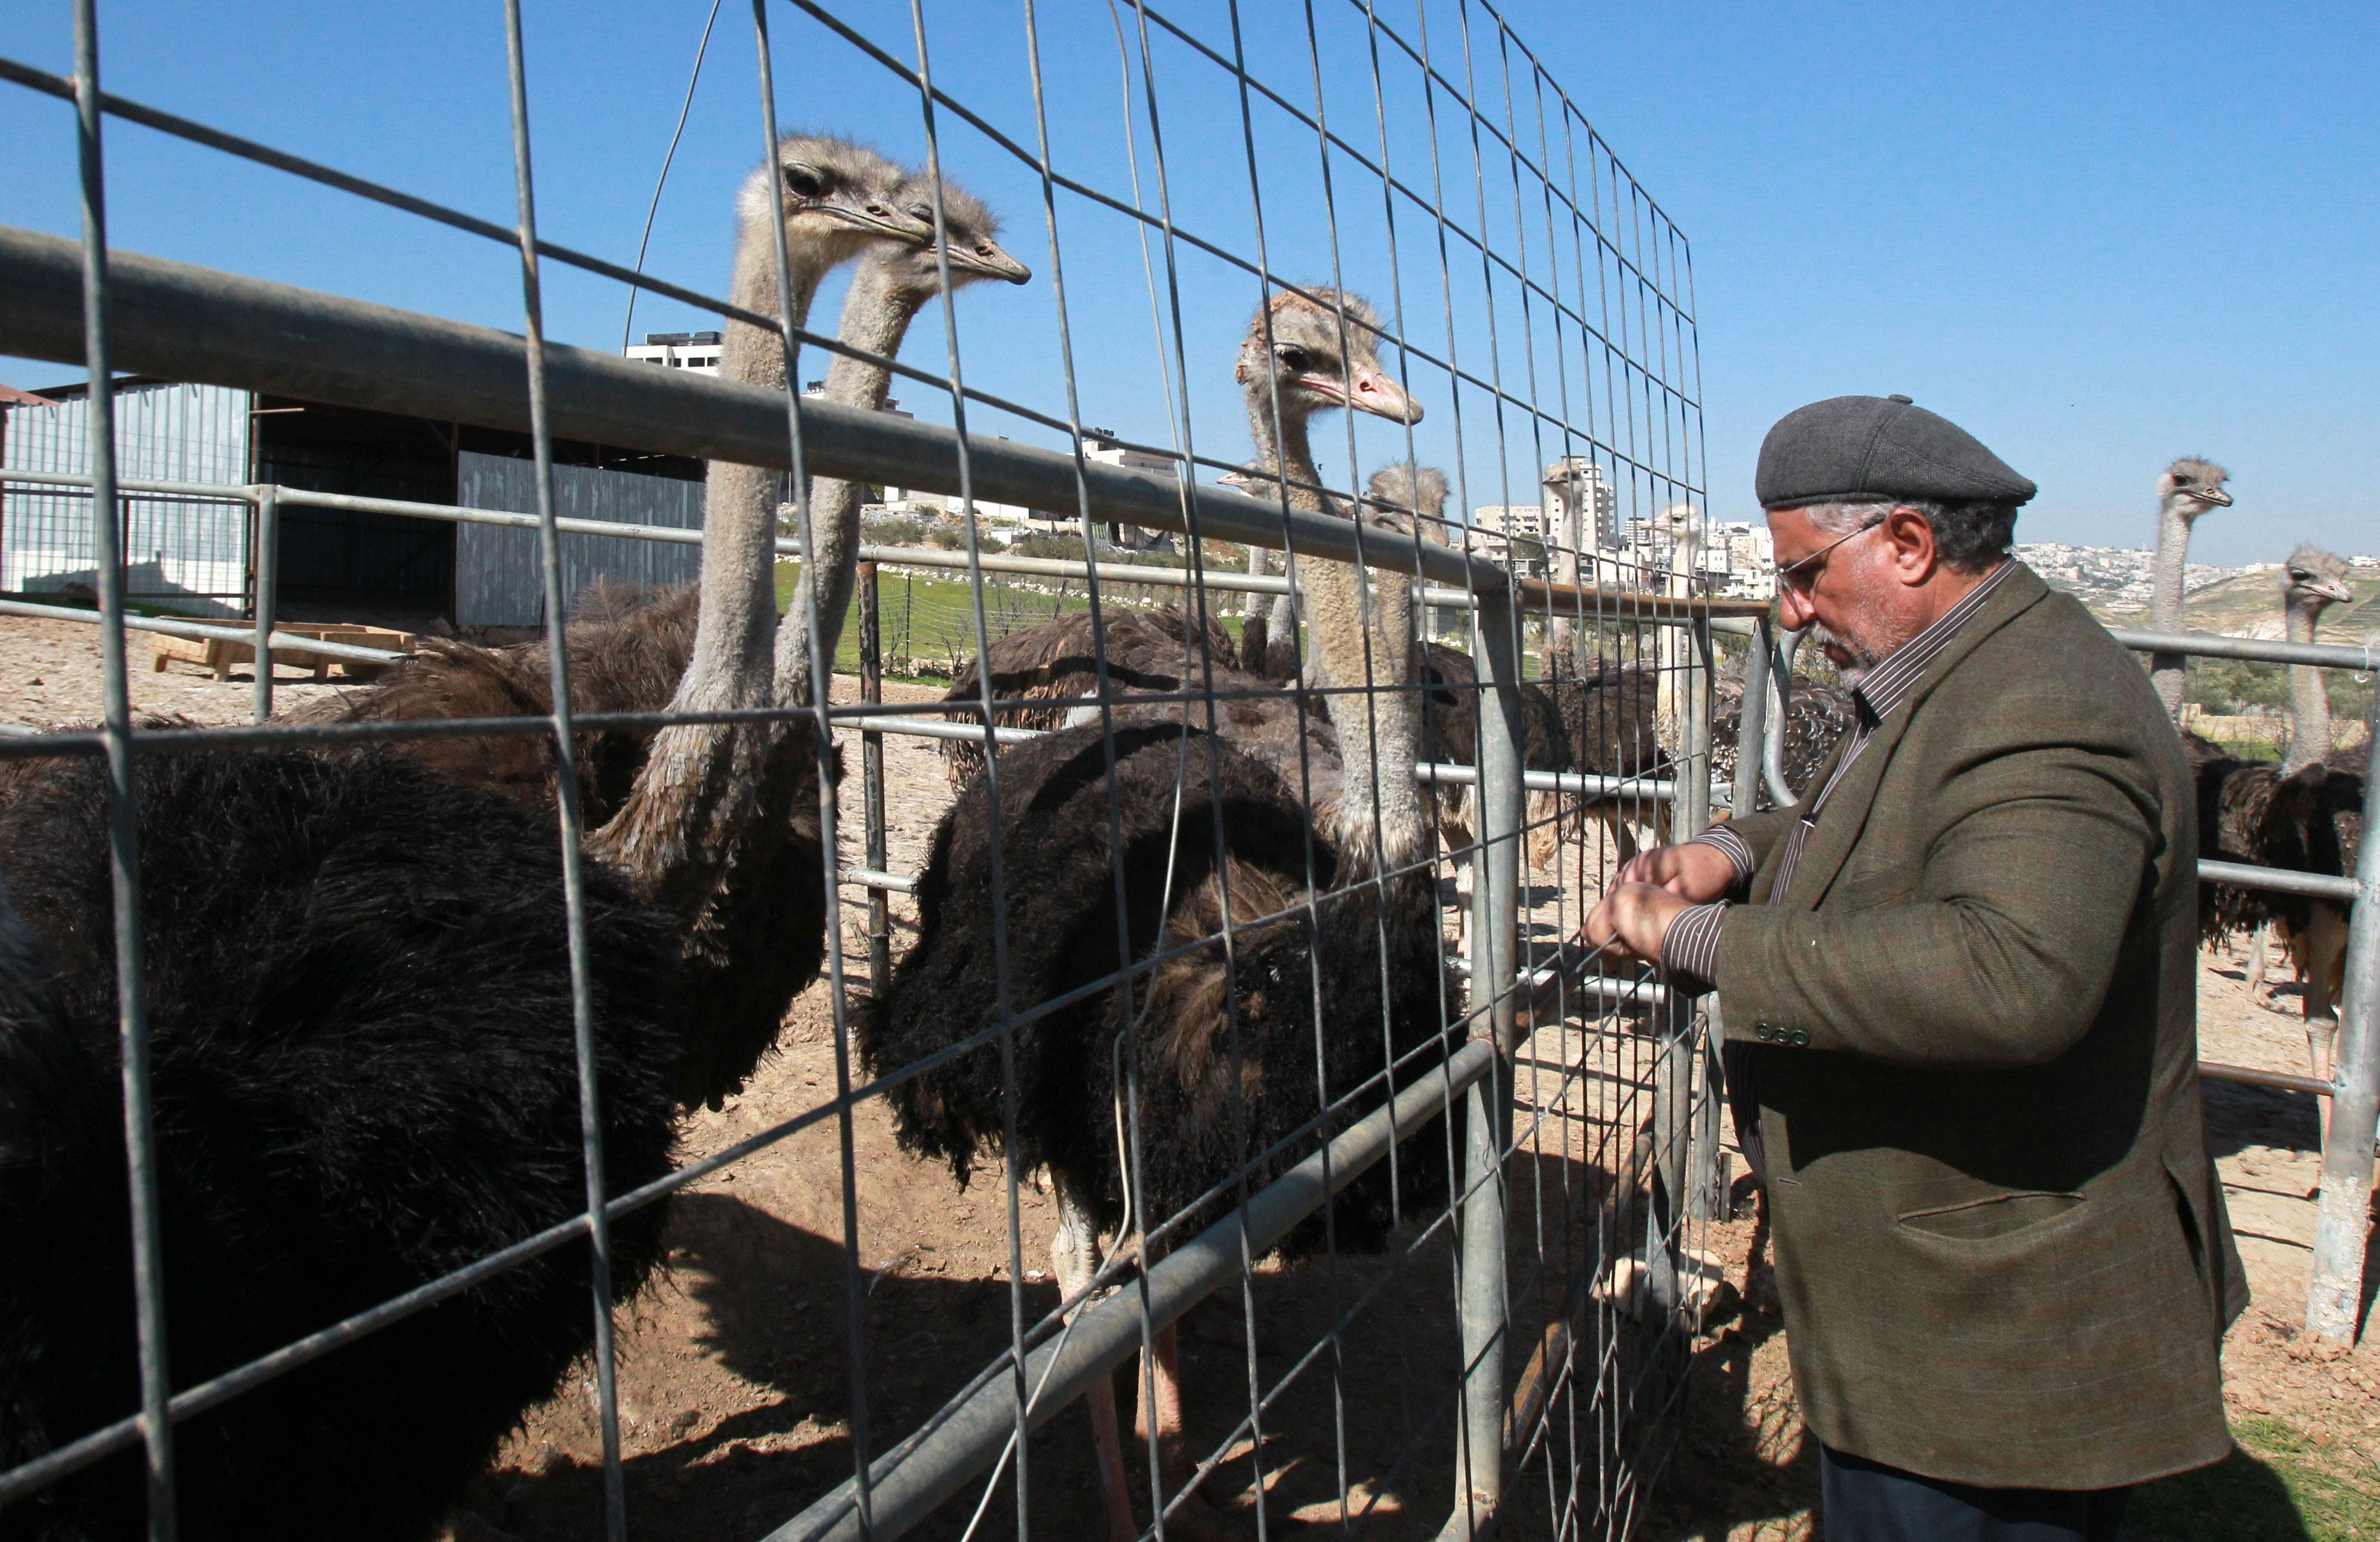 Fifty-year old Palestinian farmer Abdulrahman Abu Tir checks his ostriches at his ostrich farm near the West Bank city of Bethlehem on February 3, 2015. (AFP)